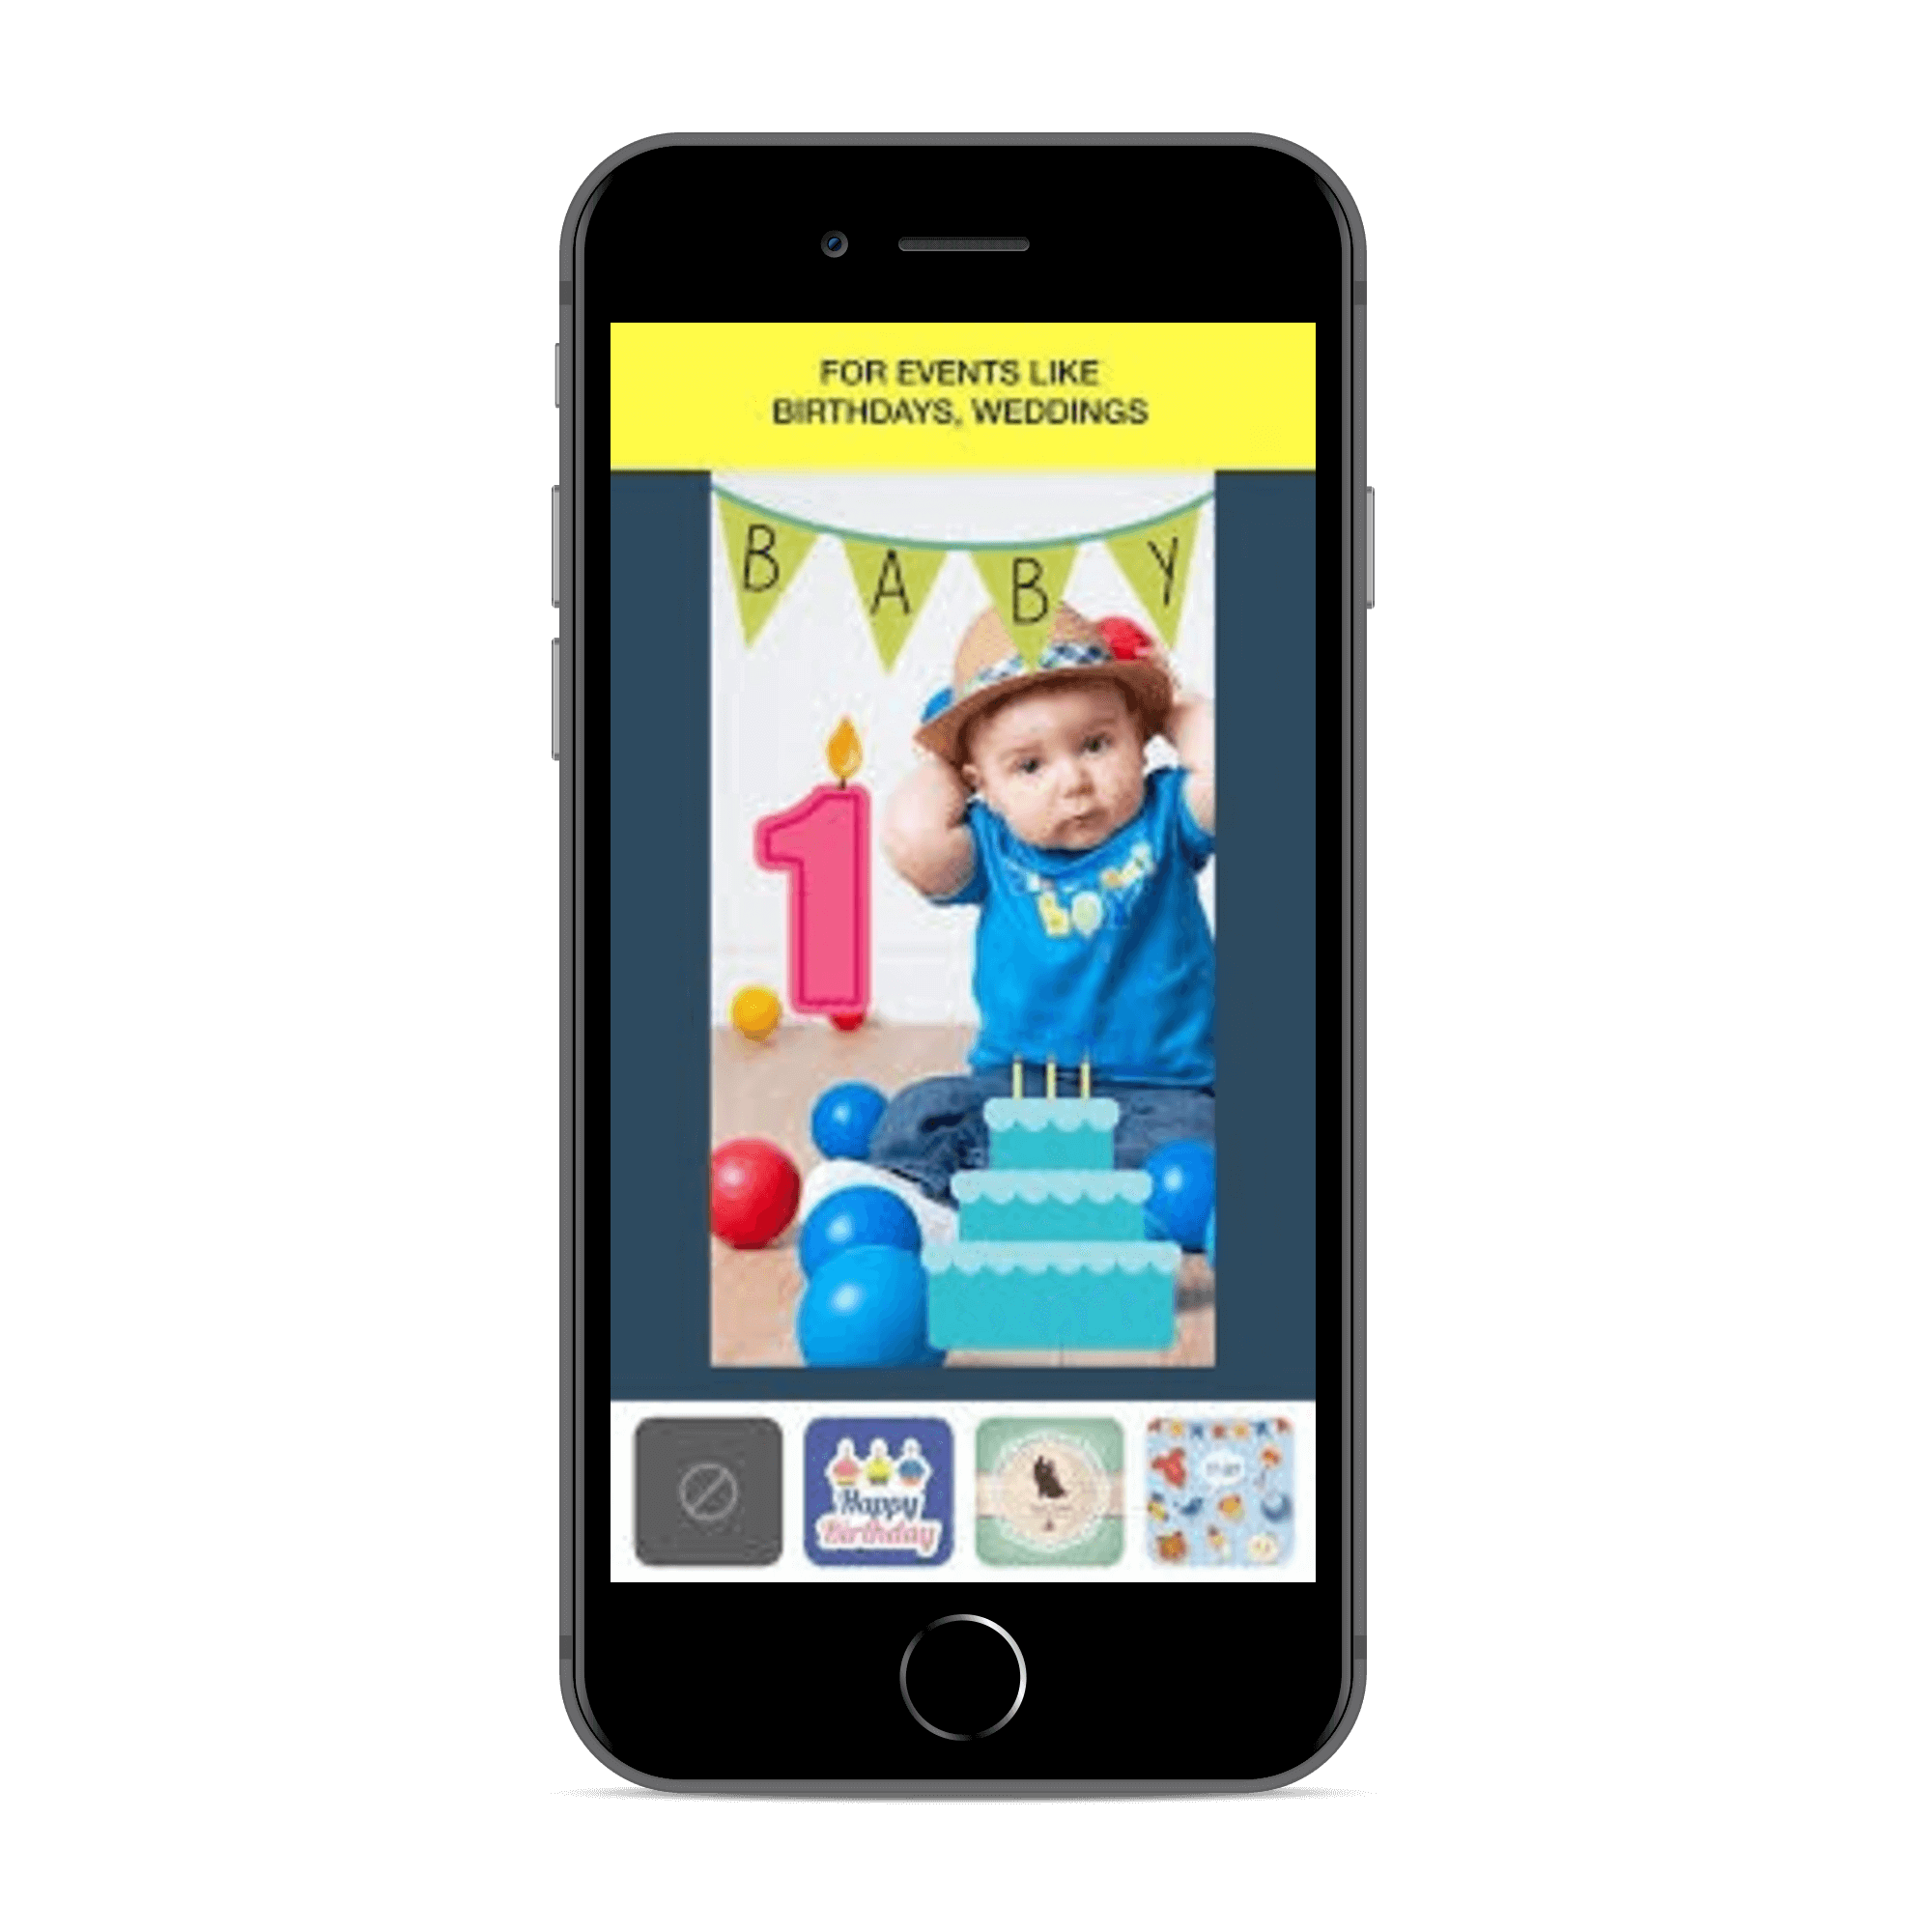 snapchat like app geofilters